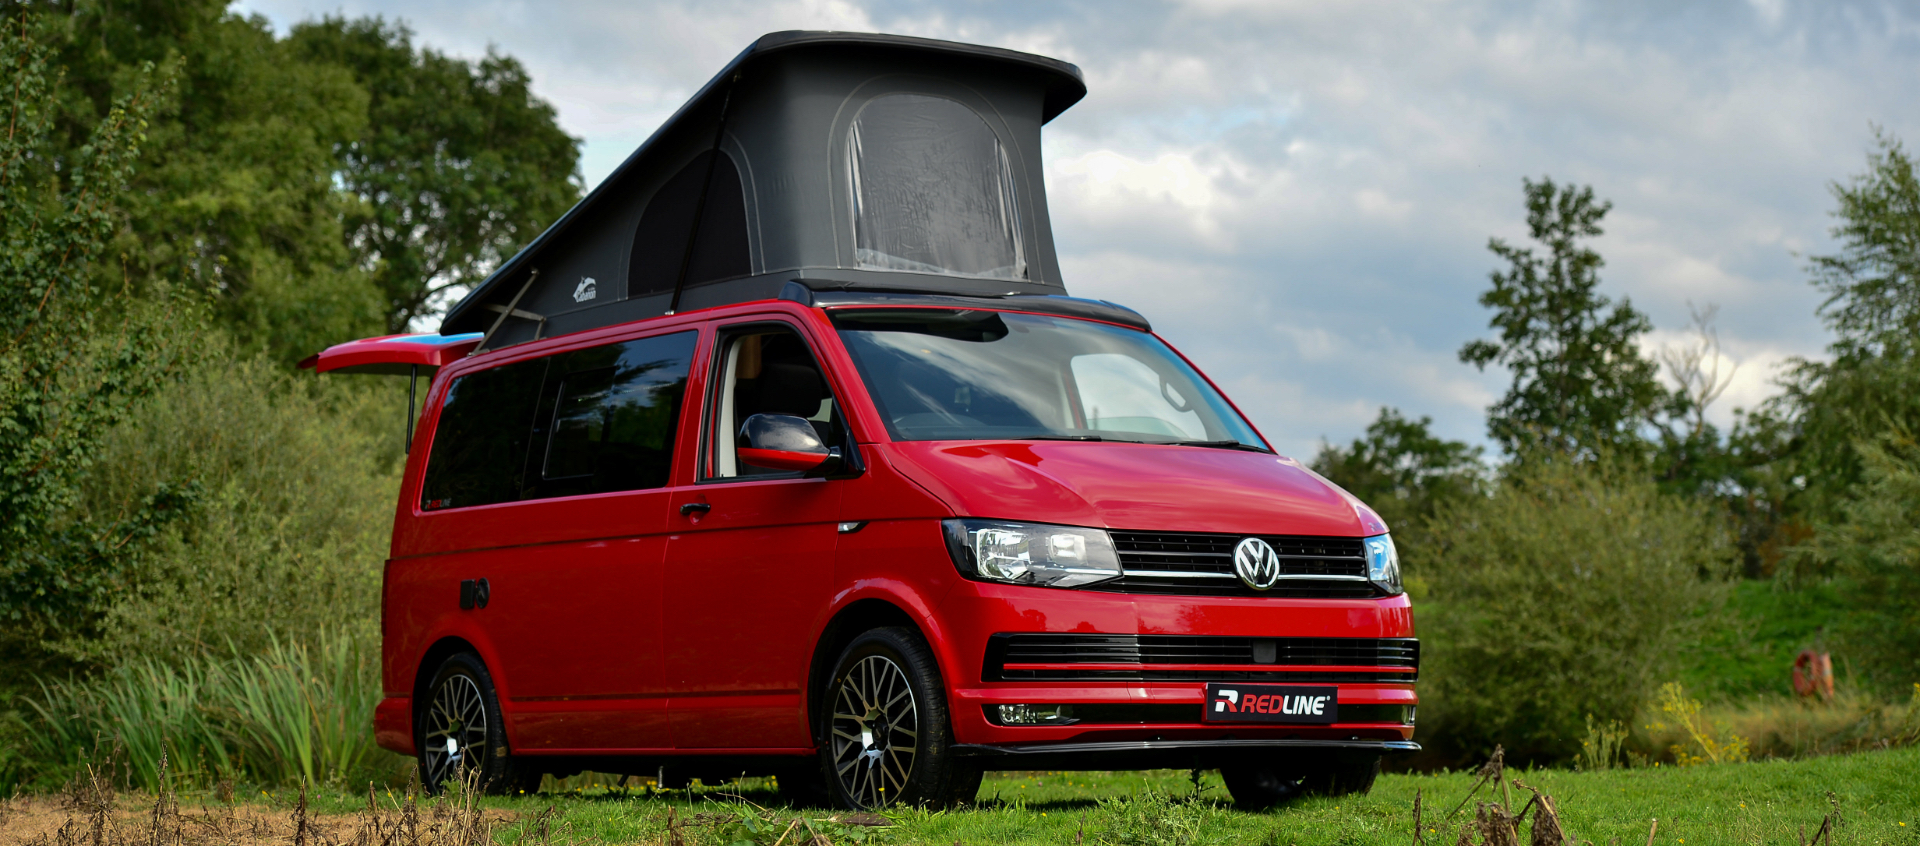 Customised Campervans